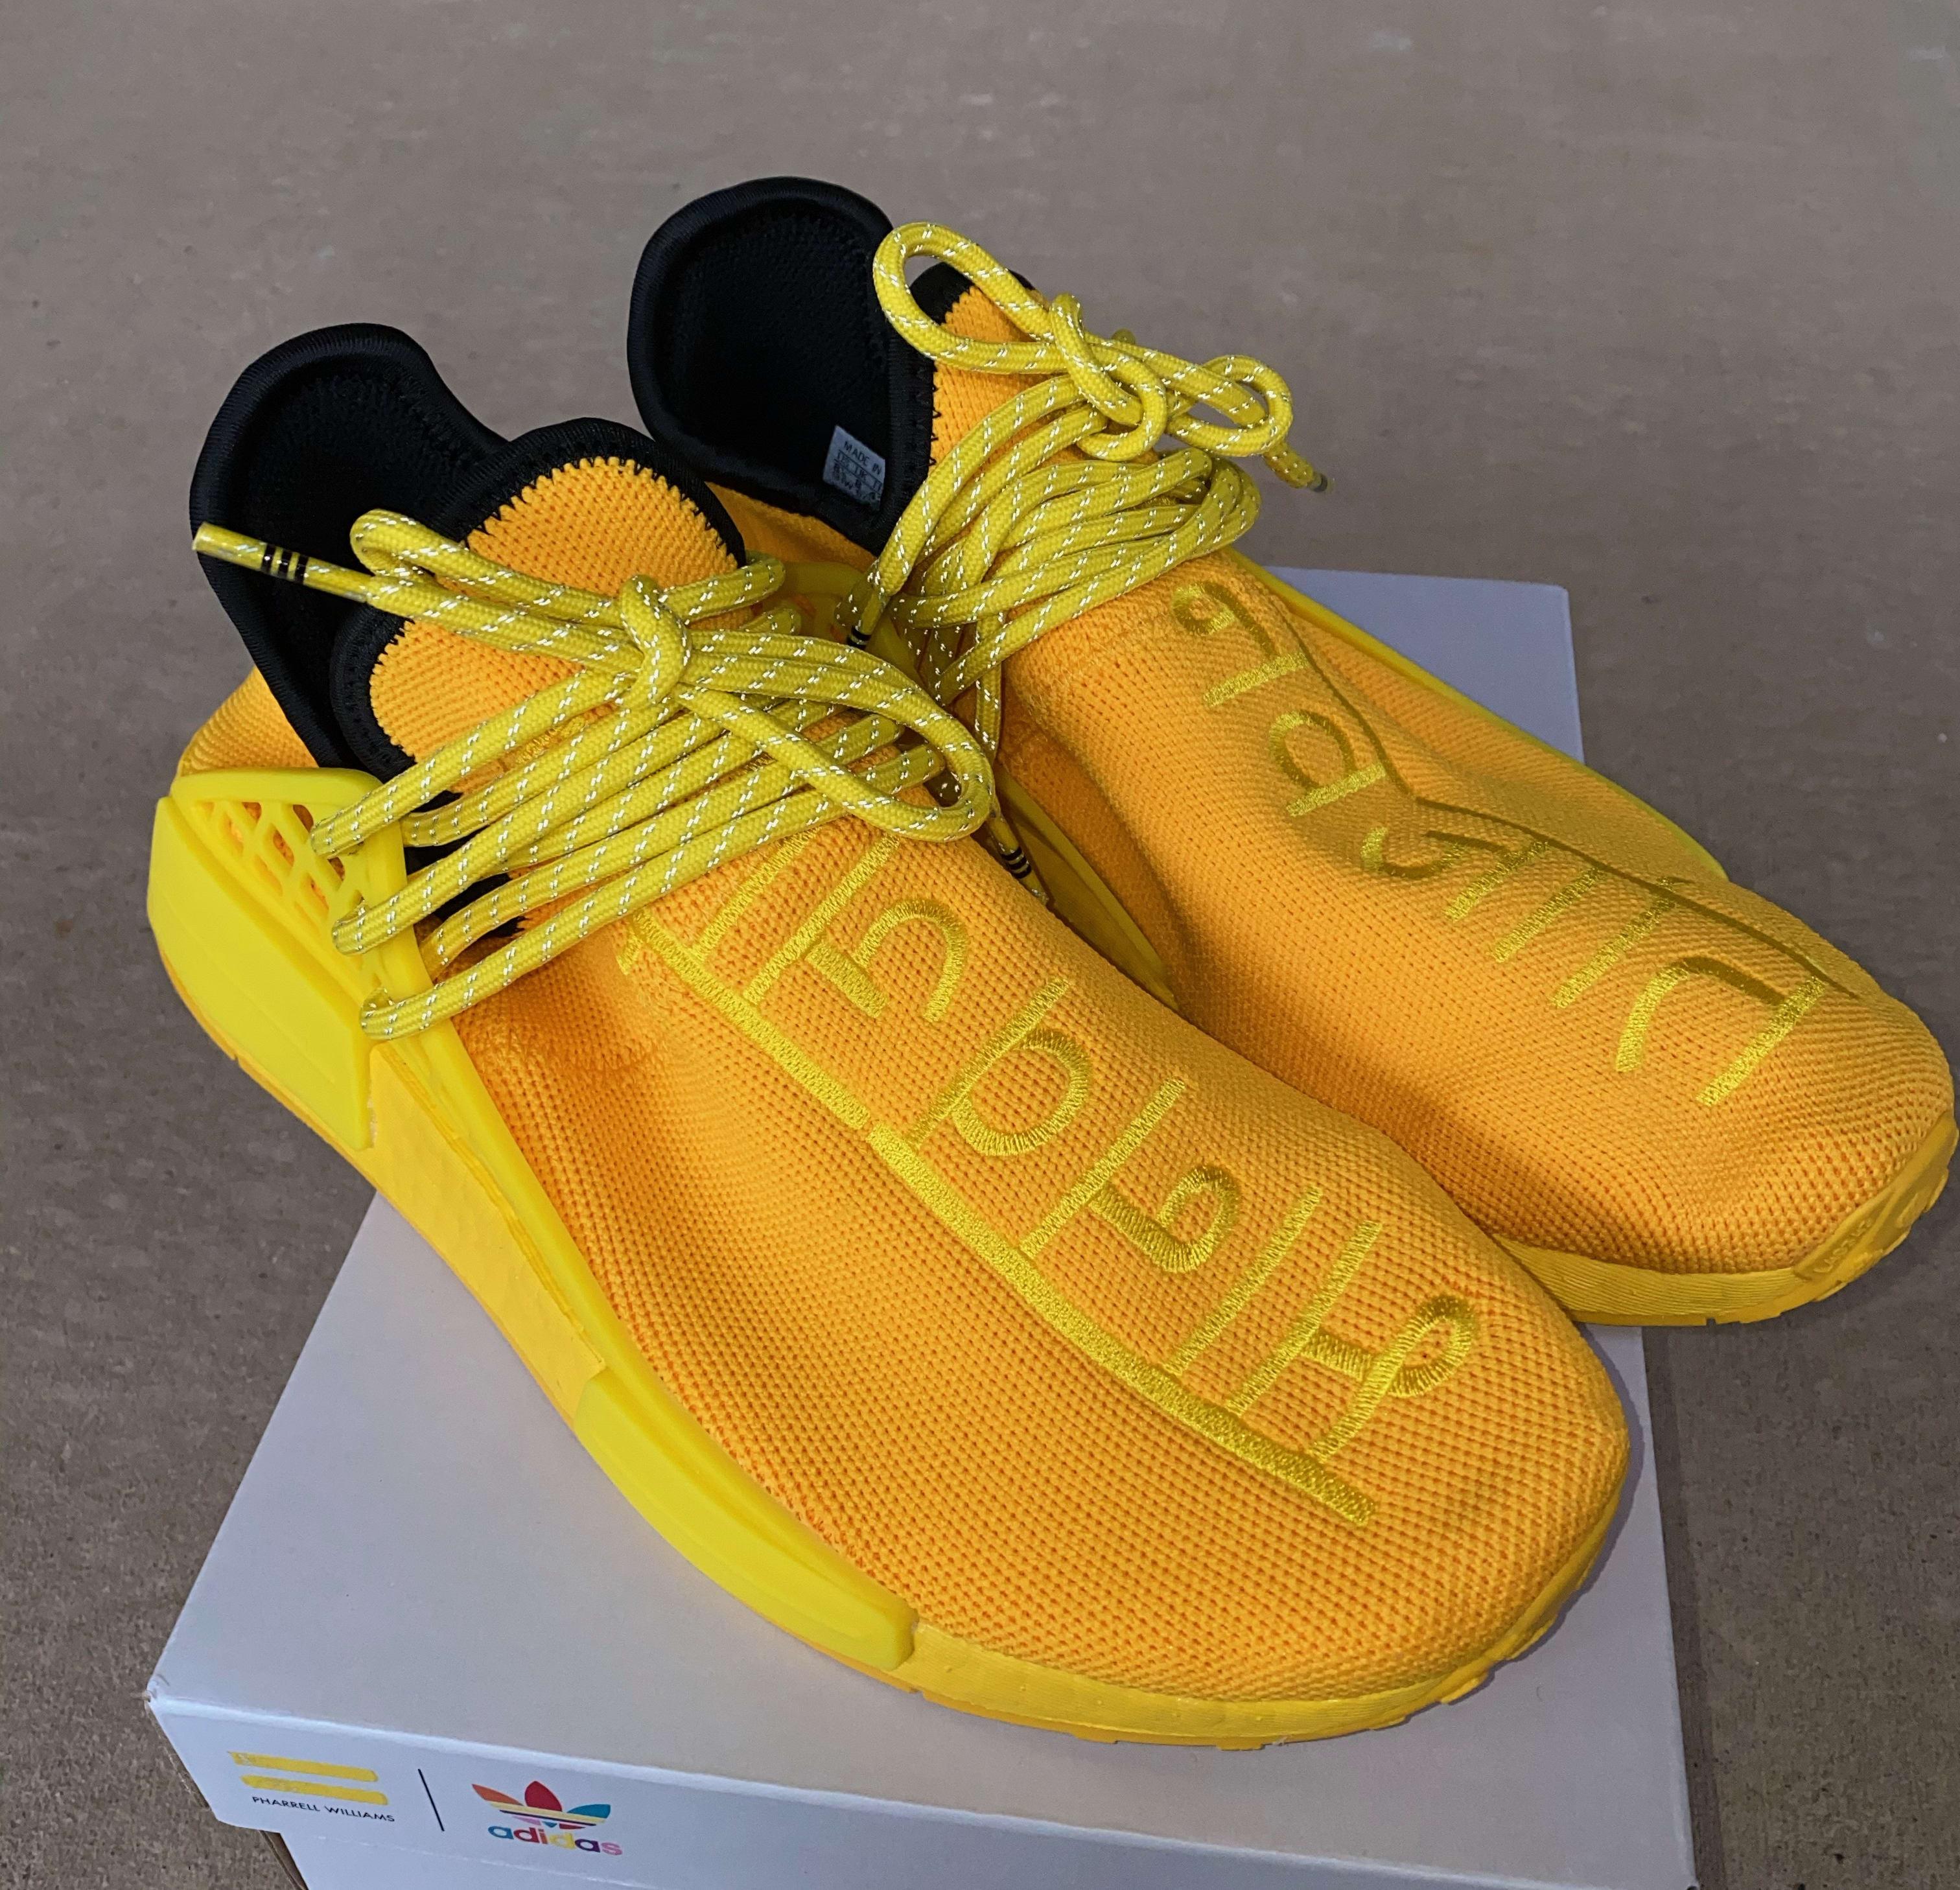 Pharrell x Adidas NMD Hu 'Yellow' GY0091 Side